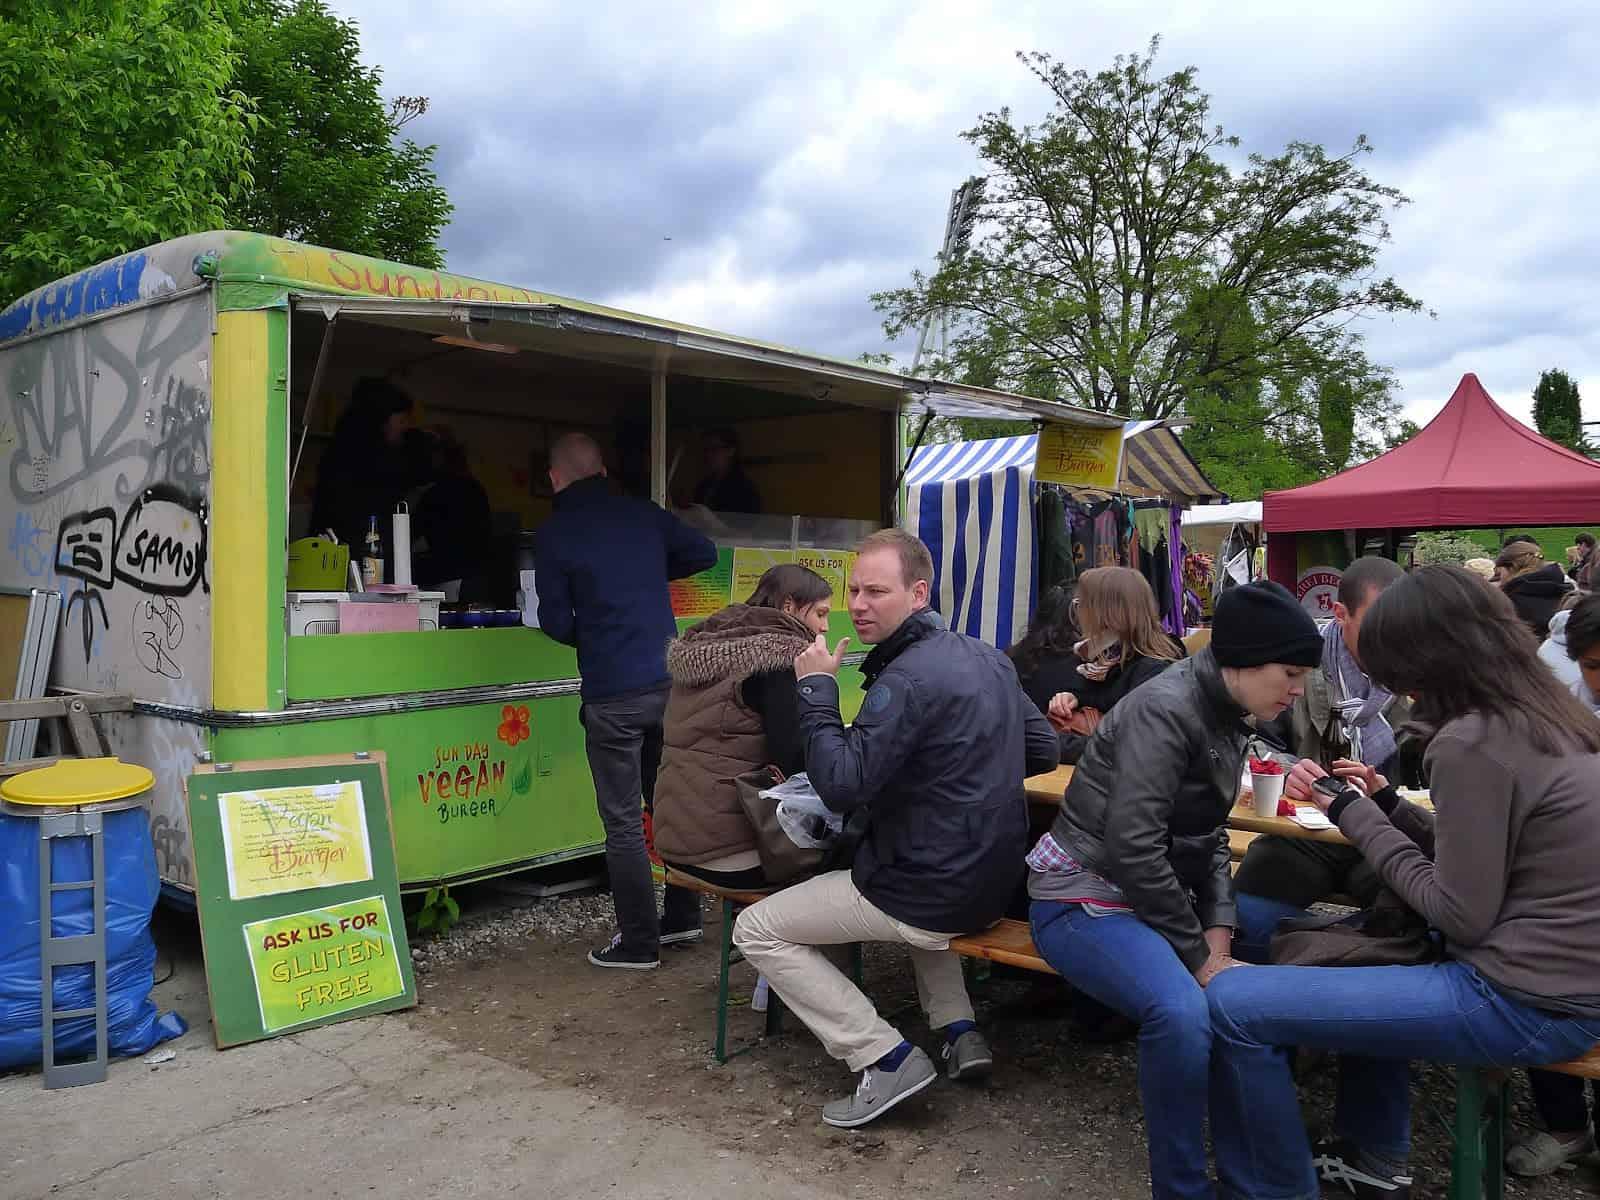 Vegetarian Restaurants in Berlin - Sun Day Burgers